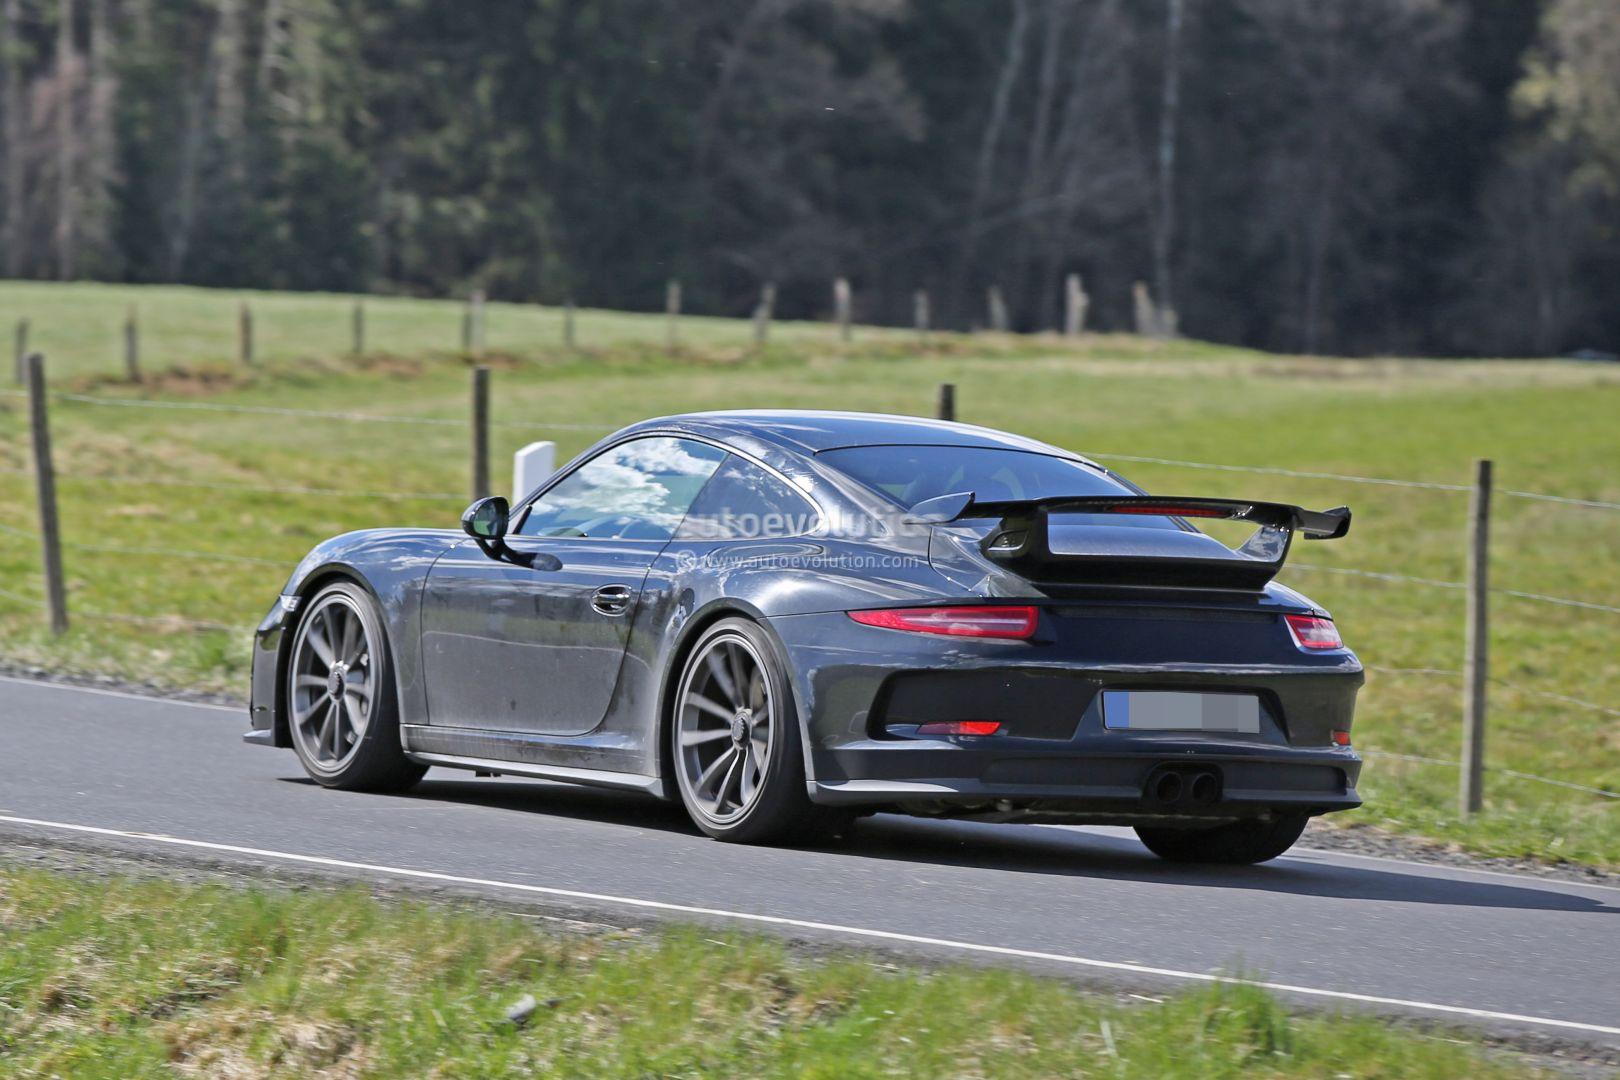 Porsche test driver accelerates in 2017 911 gt3 facelift soundtrack is glorious autoevolution